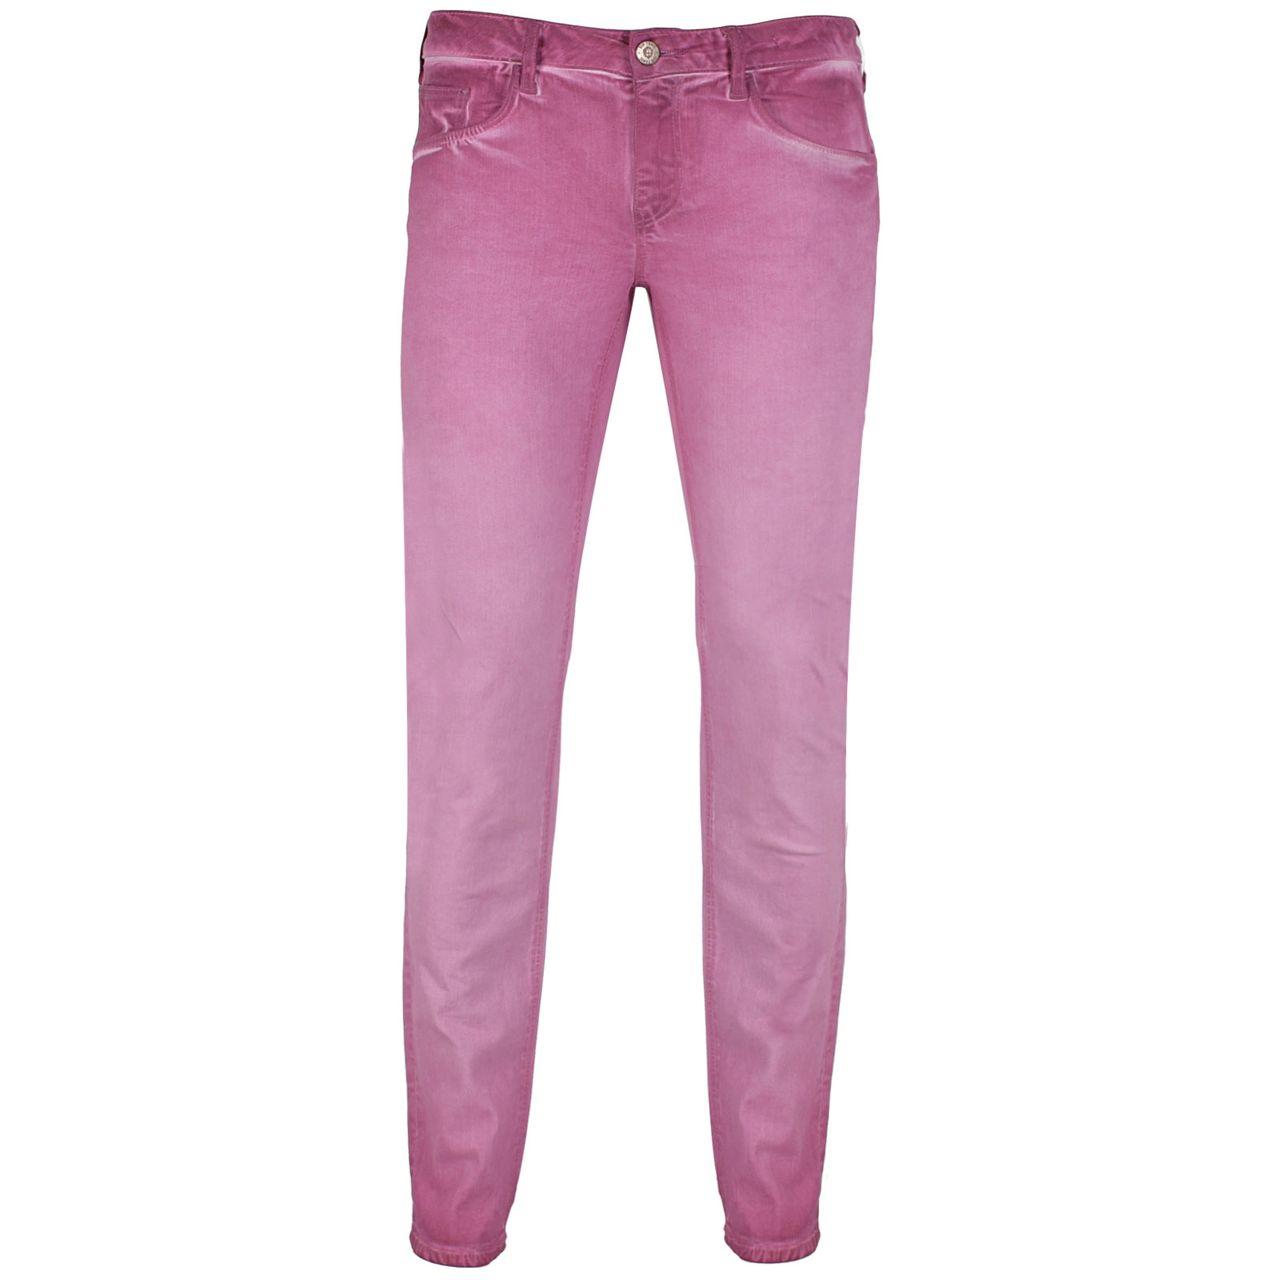 GIN TONIC Damen Slim Jeans 5-Pocket Rose Wine